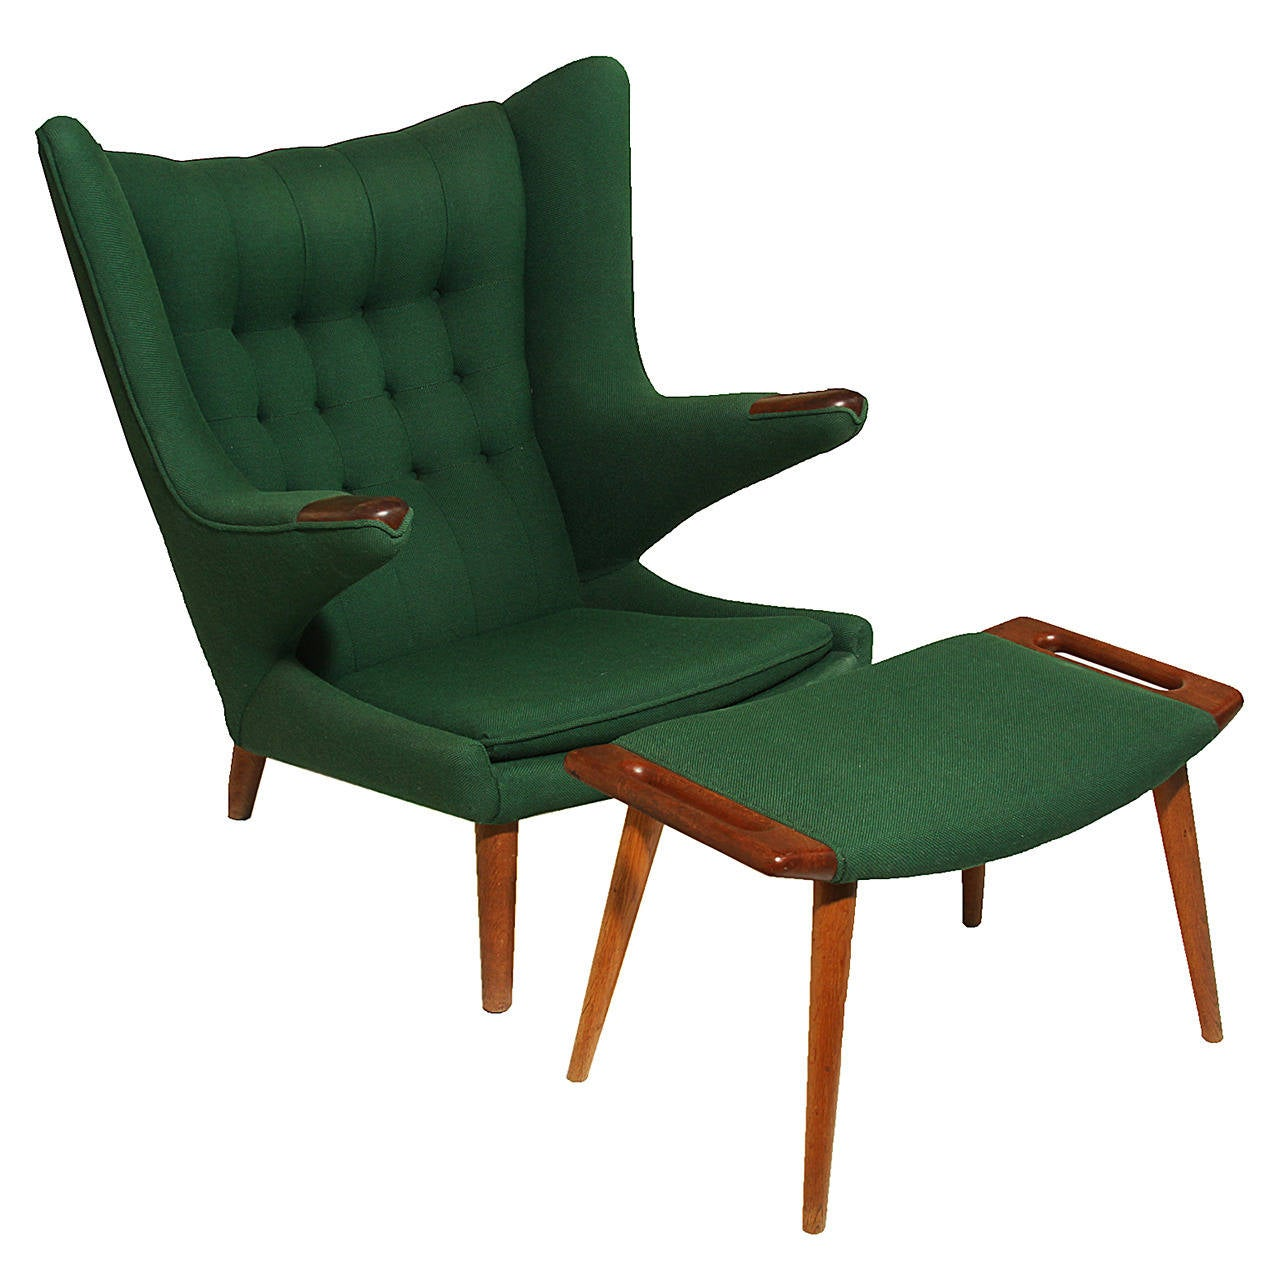 papa bear chair chiavari chairs rental price and ottoman by hans wegner at 1stdibs